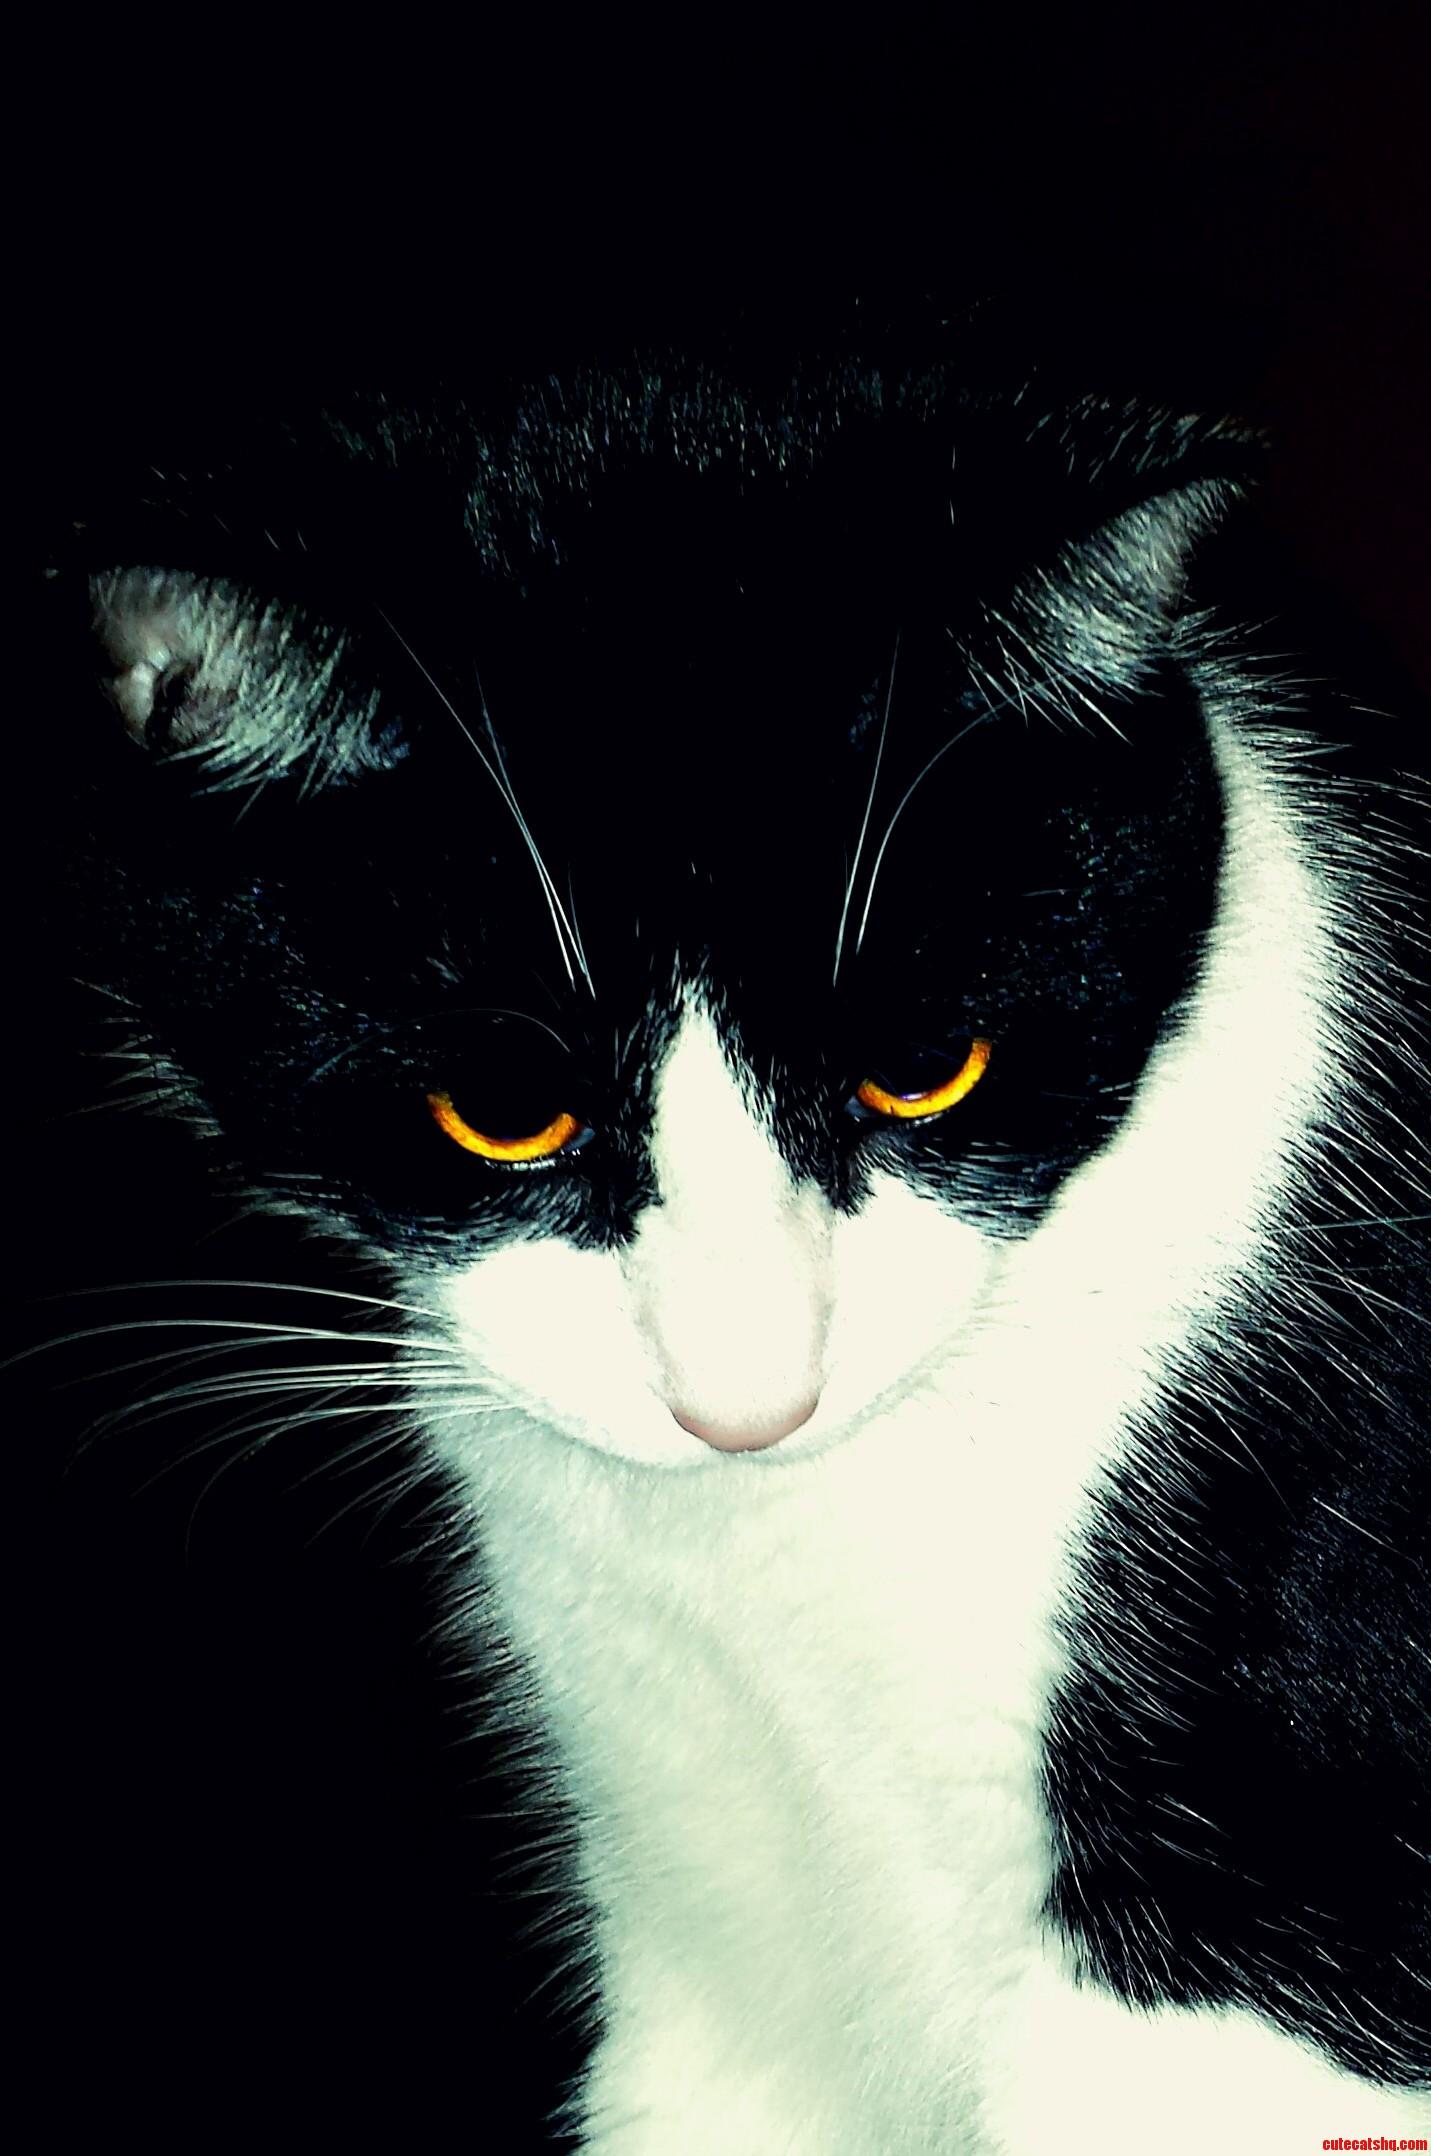 The eyes of a predator